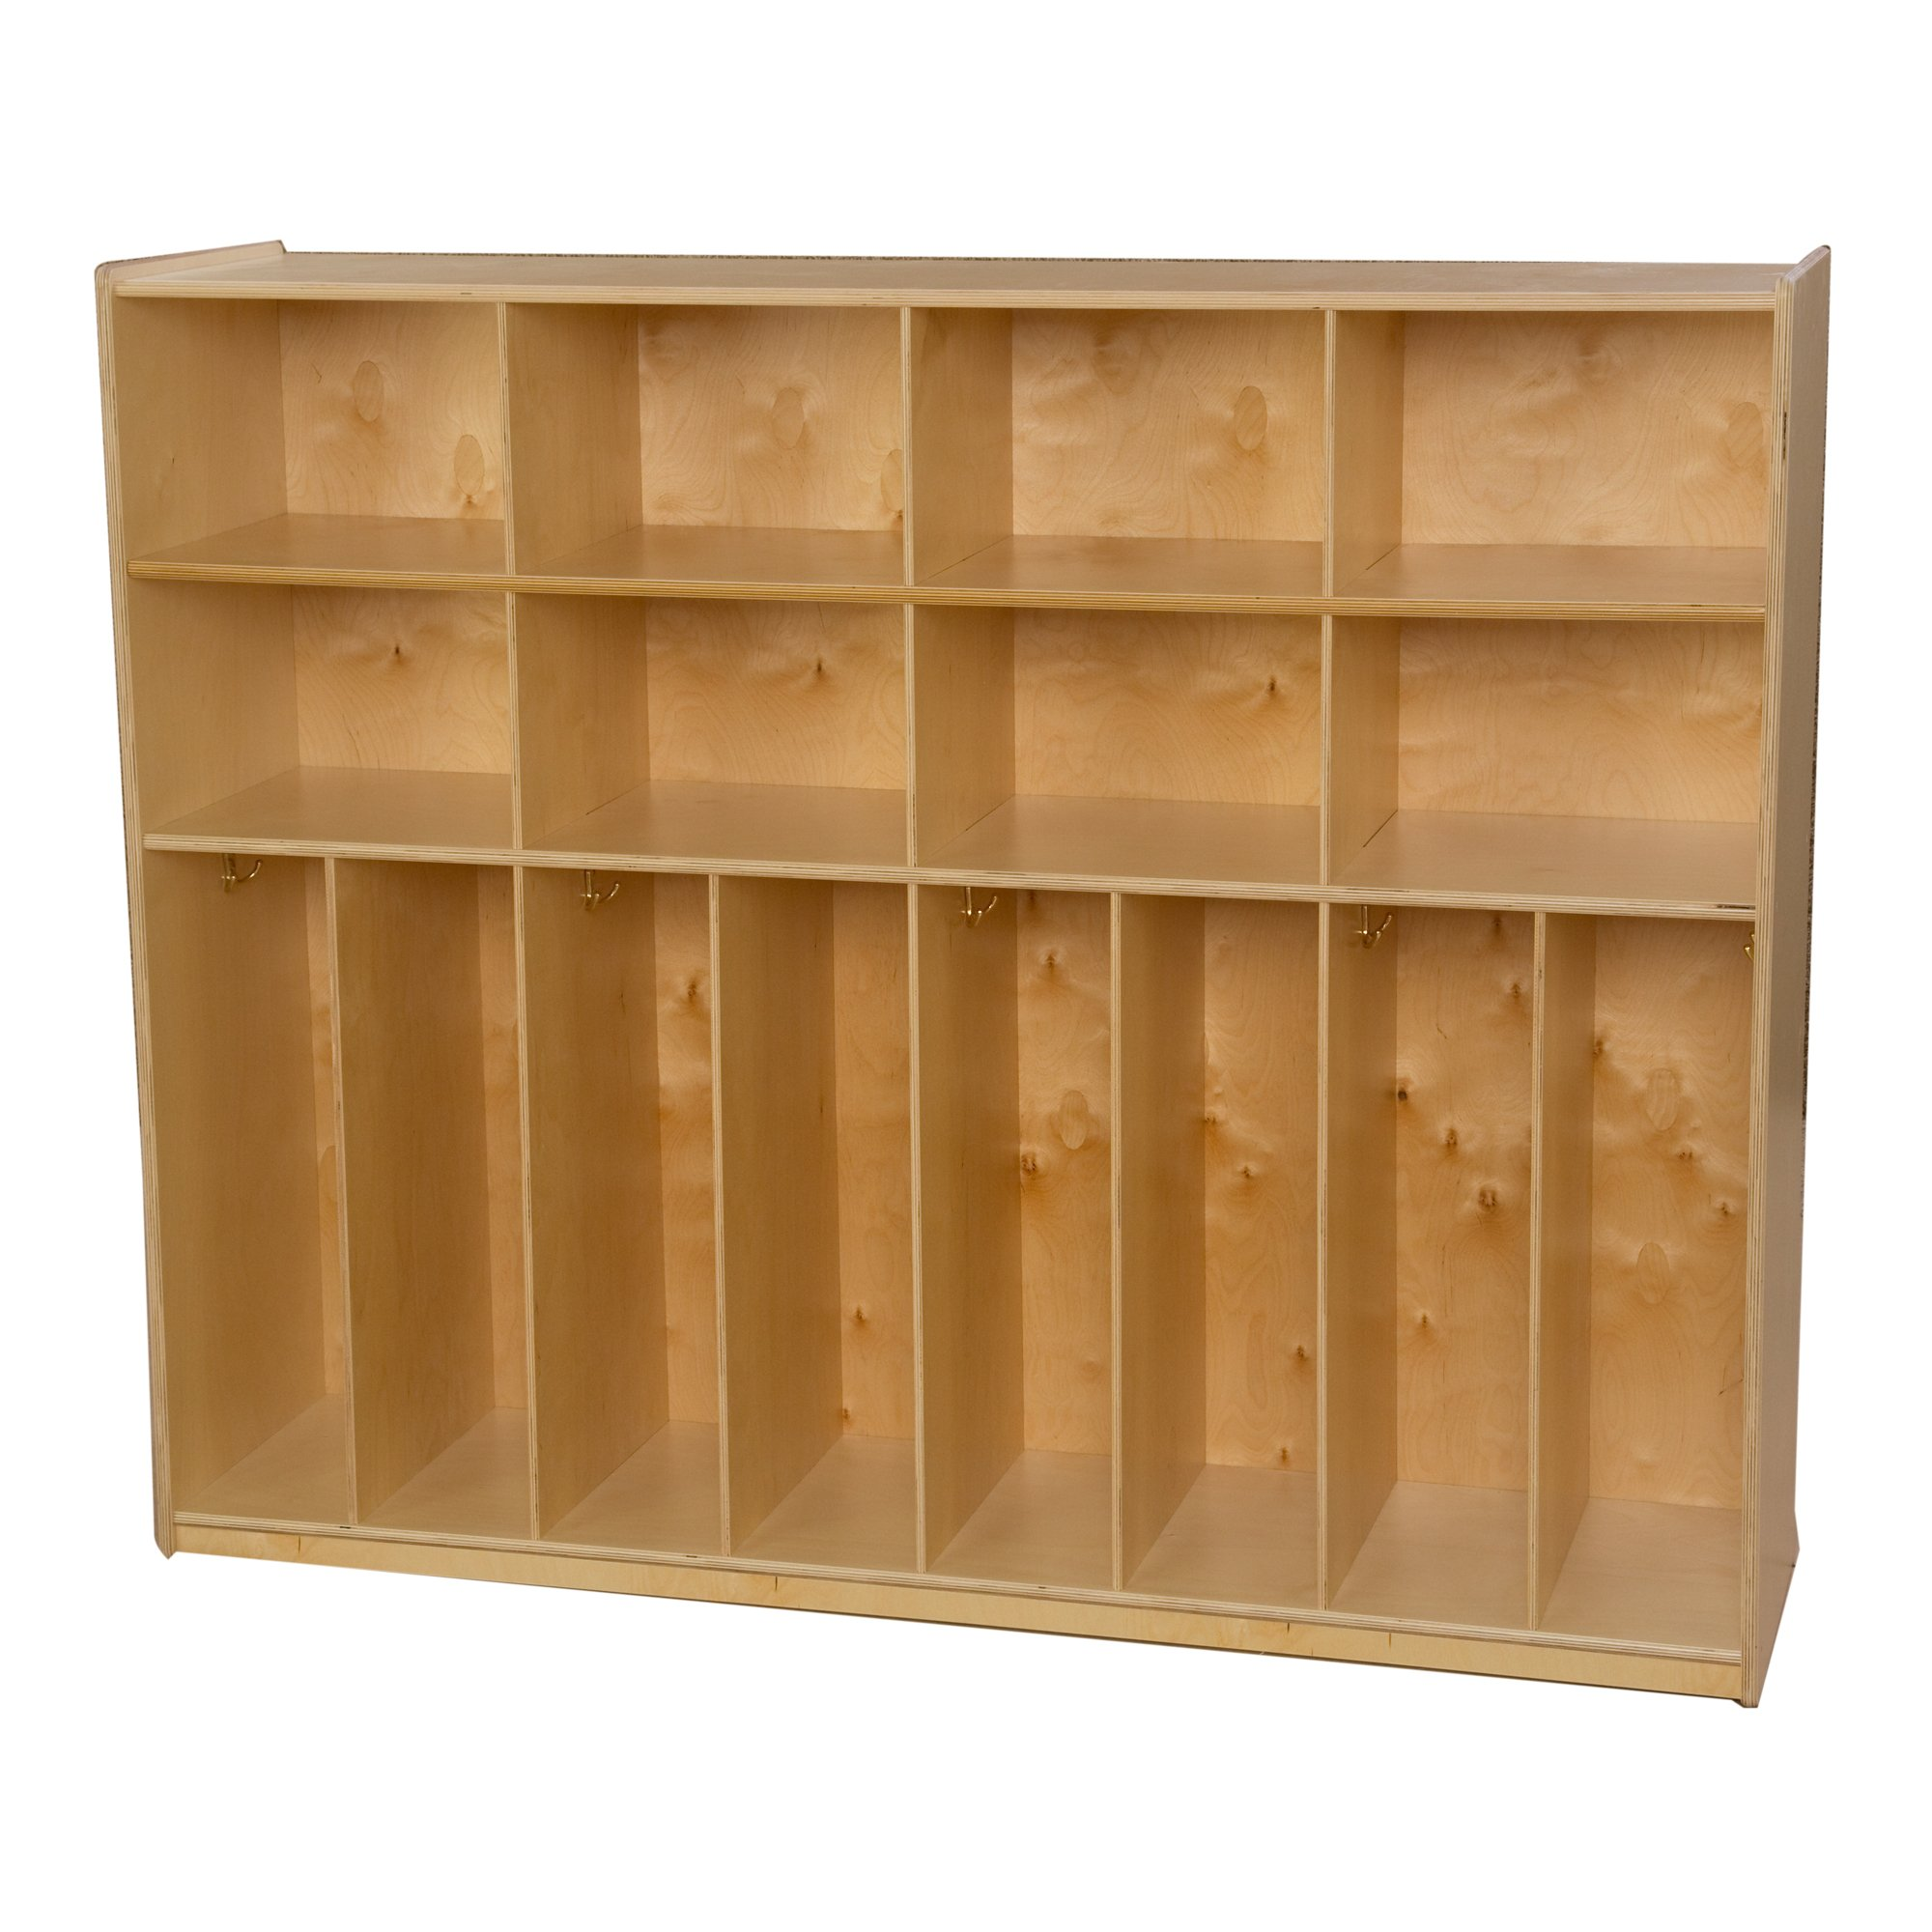 Wood Designs 50860 Neat-N-TRIM Locker - 60''W, 49'' Height, 52'' Width, 18'' Length